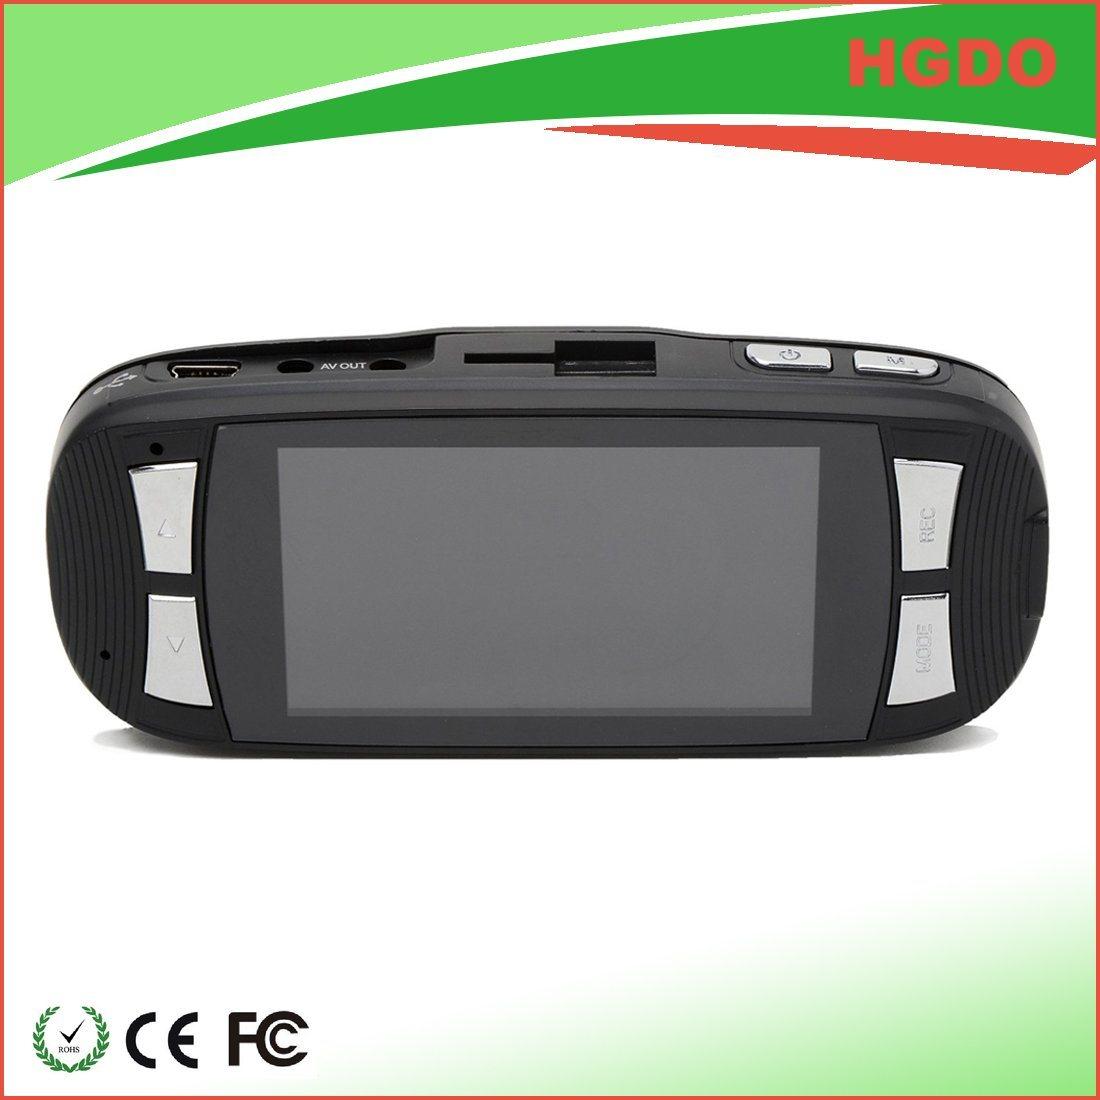 "2.7"" Wireless Mini Car DVR Vehicle Blackbox"